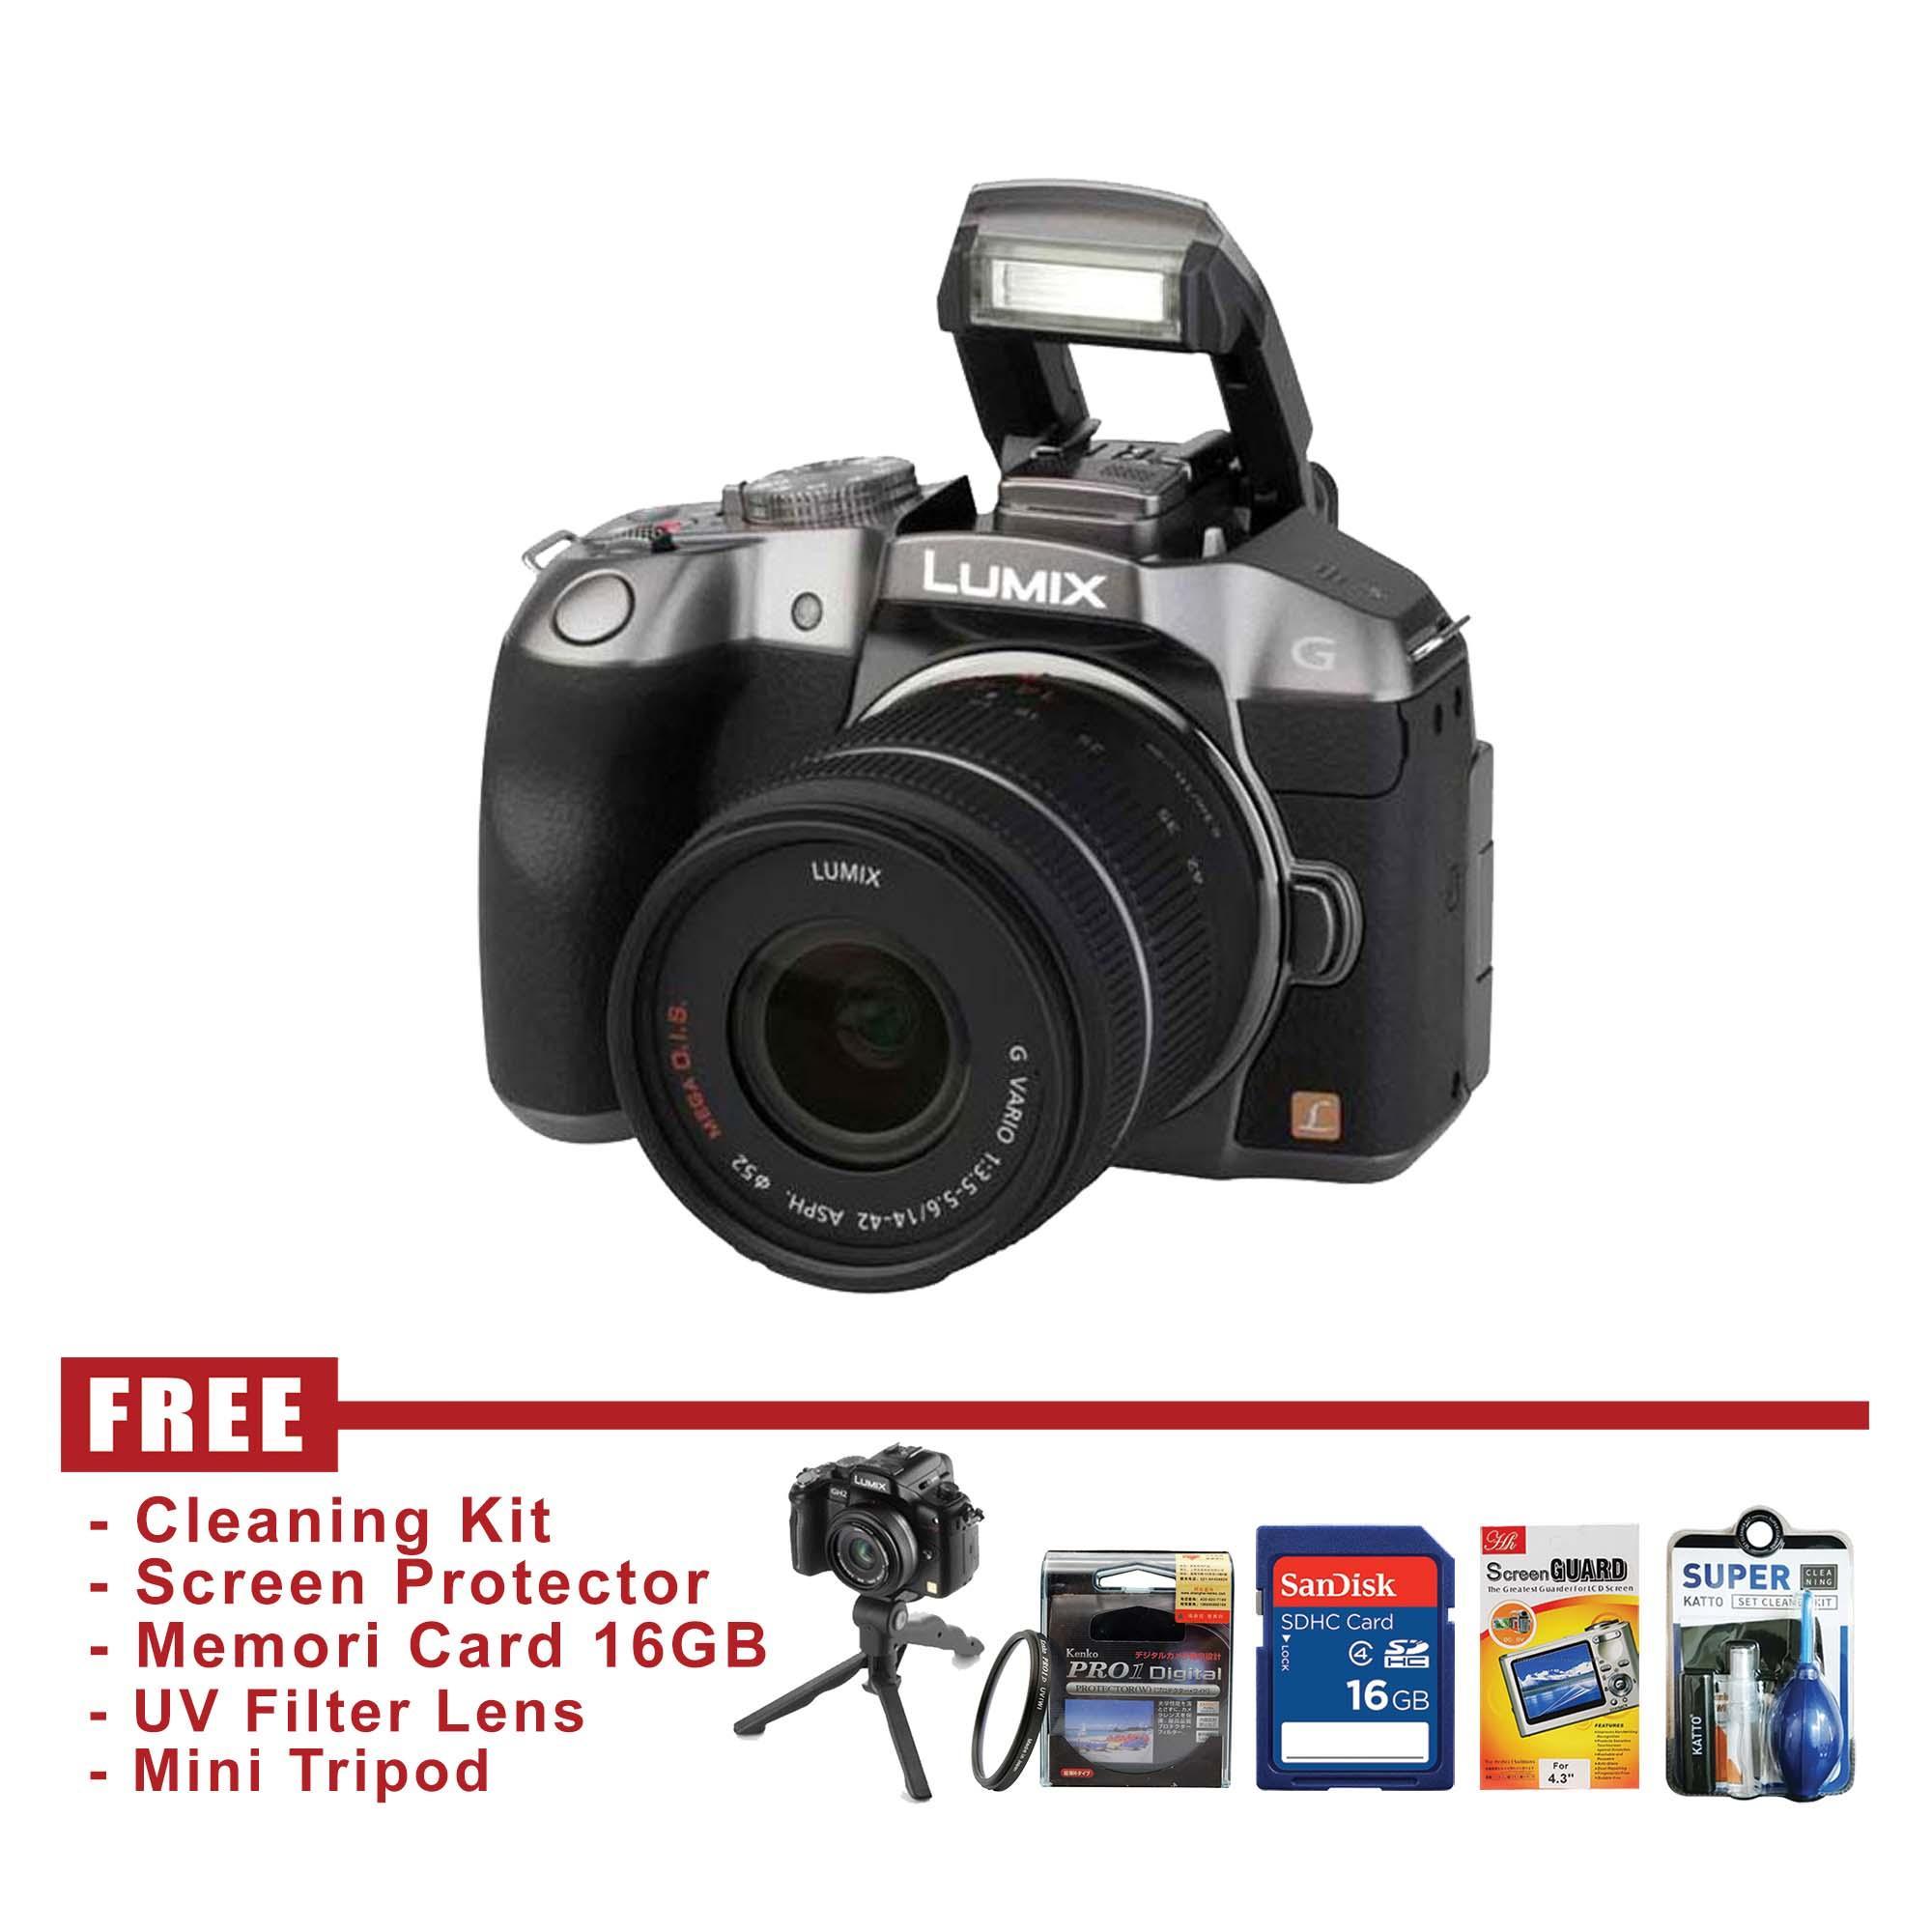 Beli Panasonic Dmc Store Marwanto606 Lumix Dc Gf9 Kit G Vario 12 32mm F 35 56 Orange G7k 14 42mm Mega Ois Kamera Mirrorless Silver Free